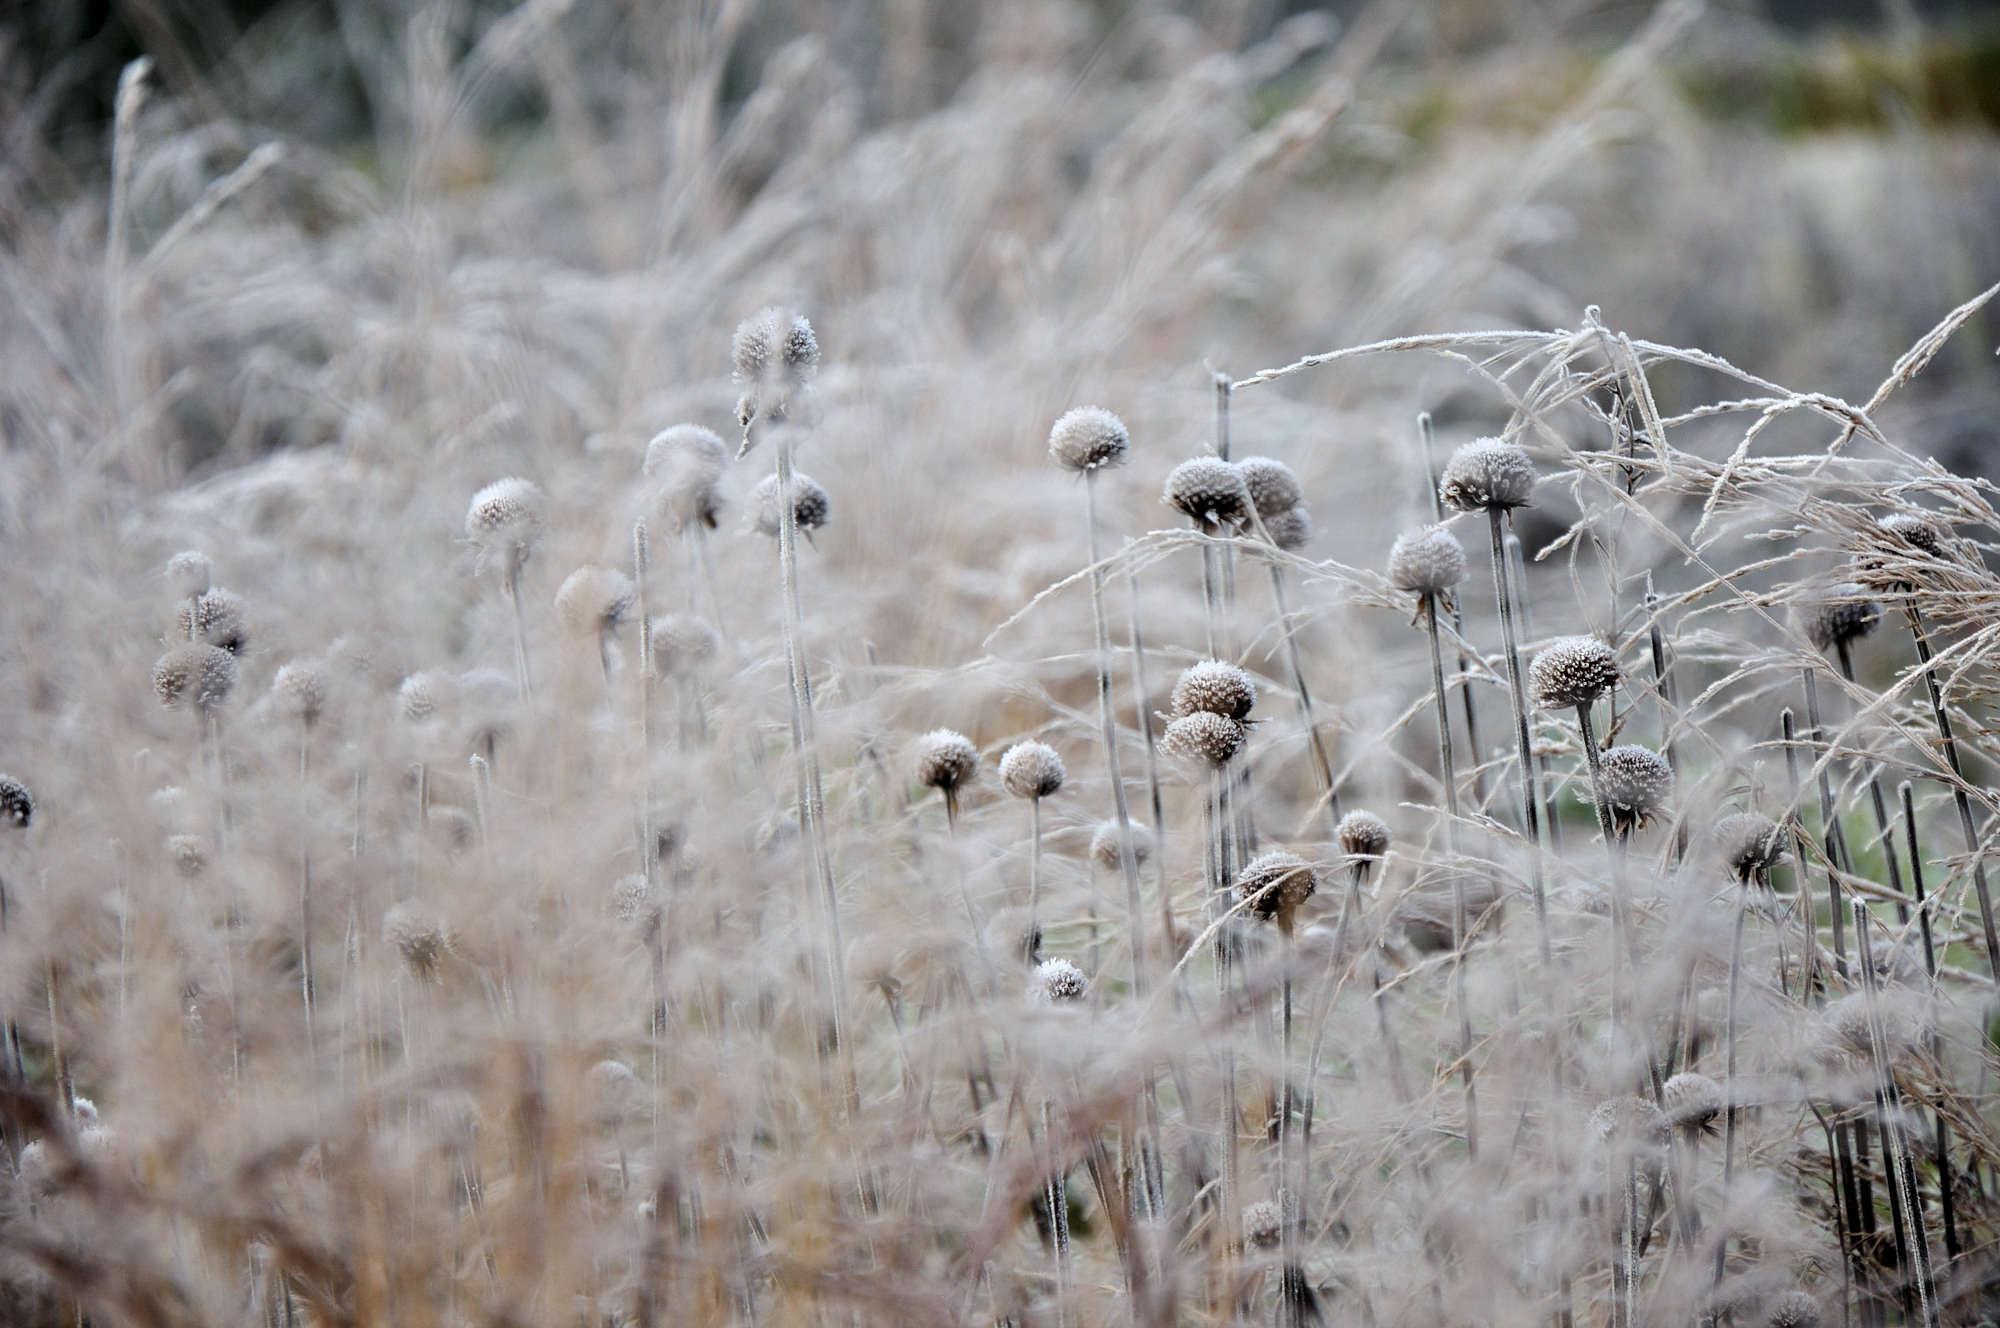 The stiff skeletons of Monarda 'Prairienacht' emerge from a veil of feathery Panicum virgatum 'Shenandoah'.